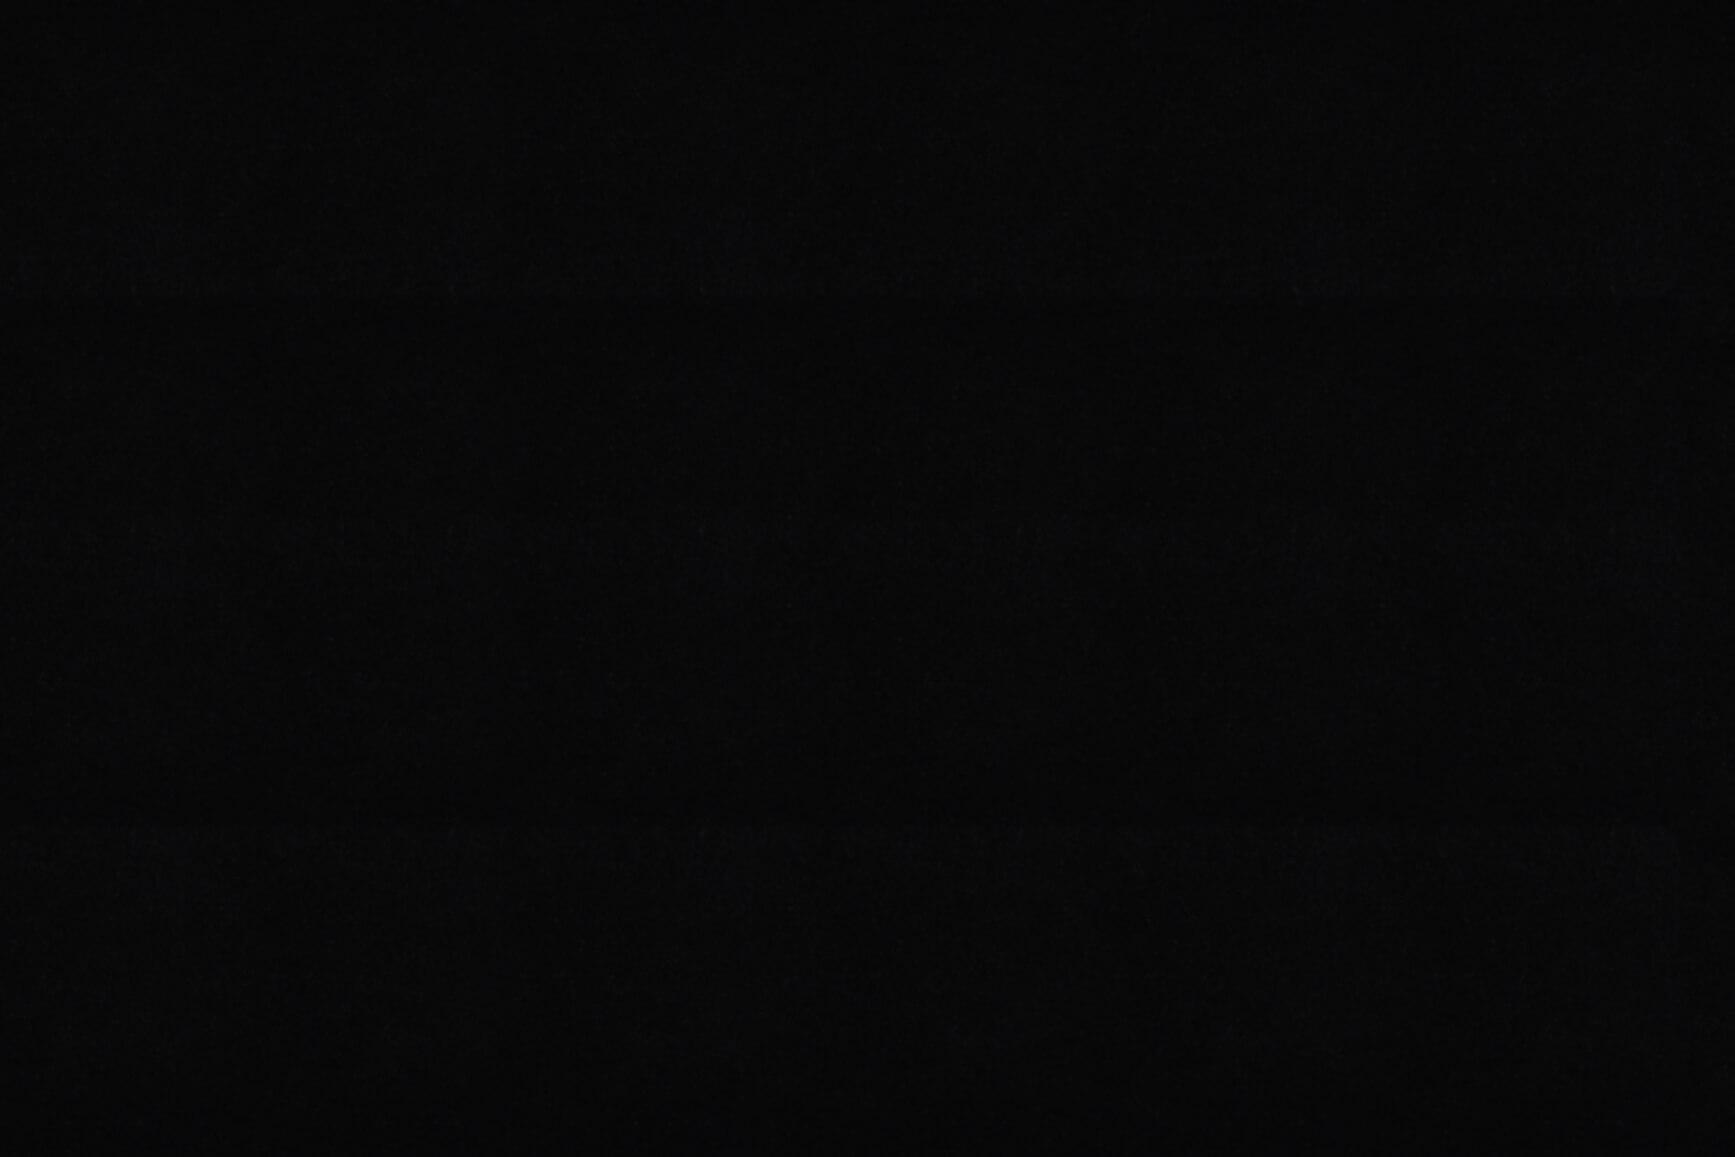 Gobi black kvarc Mermeri i Graniti Ilić